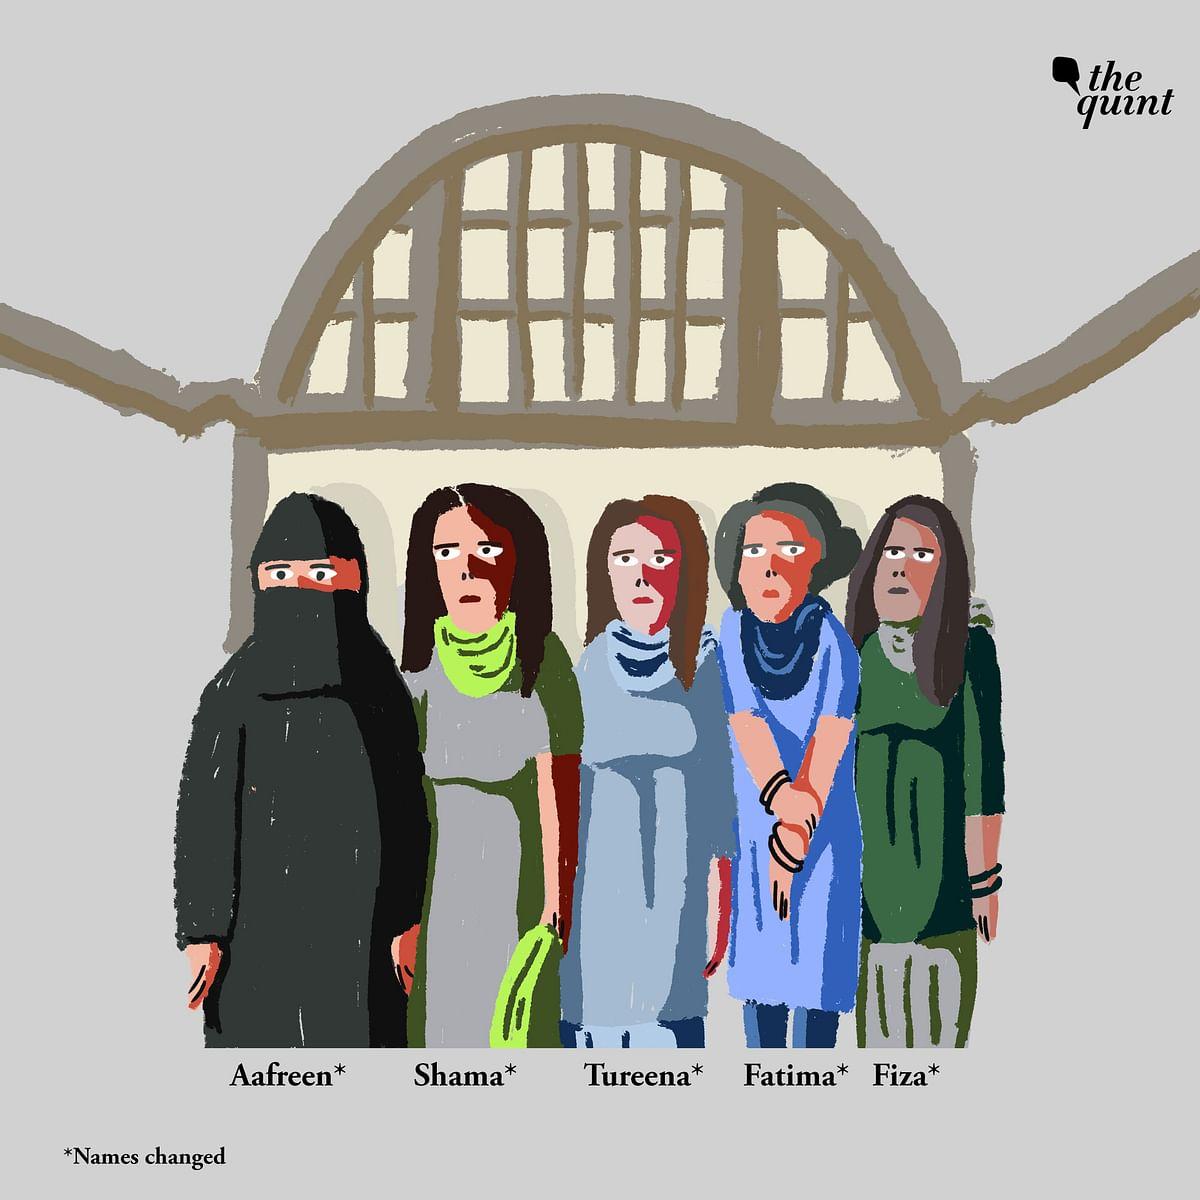 All five women were raped in Fugana village on the night of 8 September during the 2013 Muzaffarnagar riots in Uttar Pradesh.